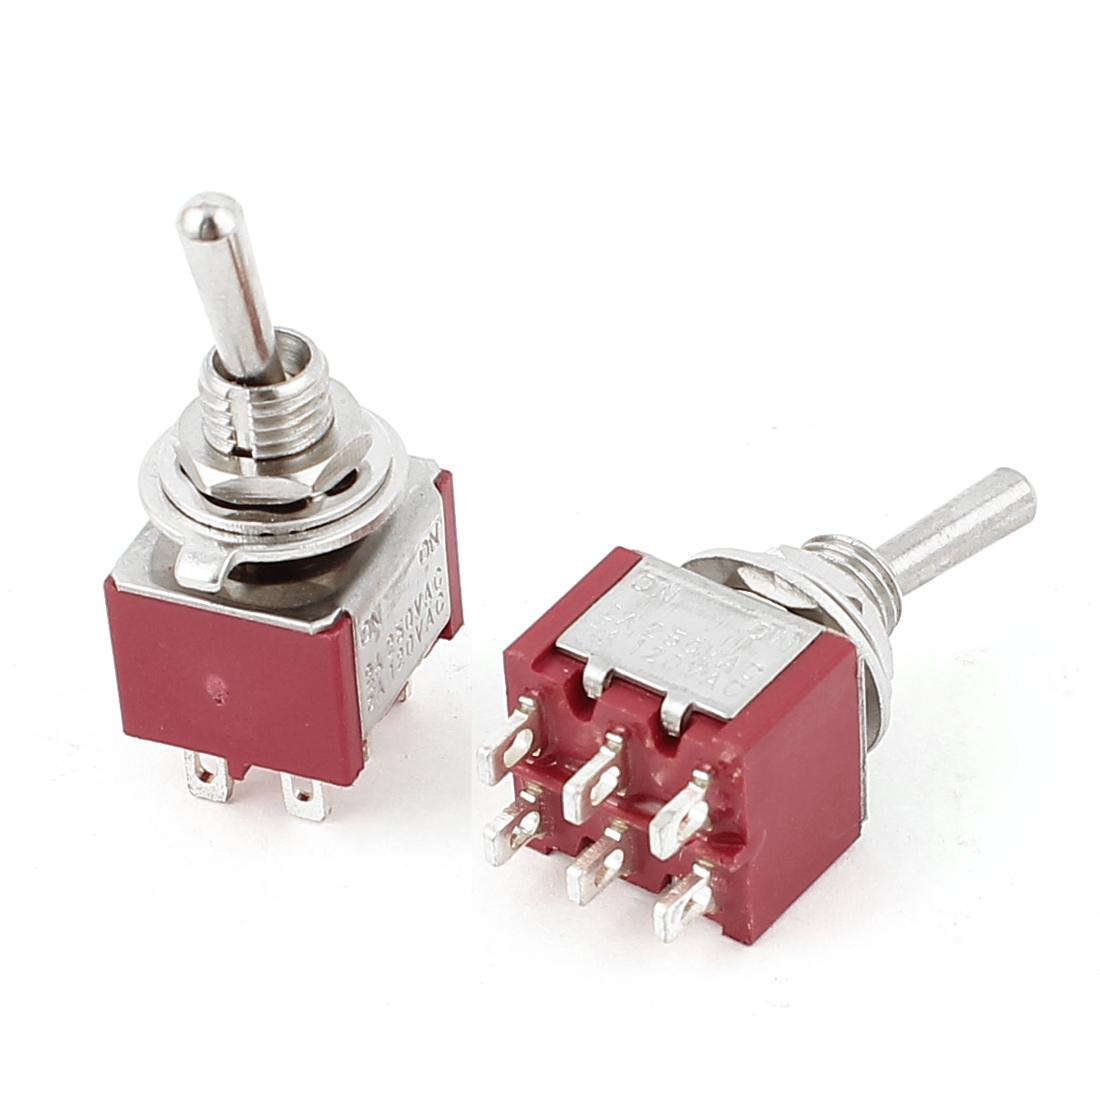 AC 250V 2A/AC 120V 5A Centre Spring Bias DPDT On-On Toggle Switch 2pcs